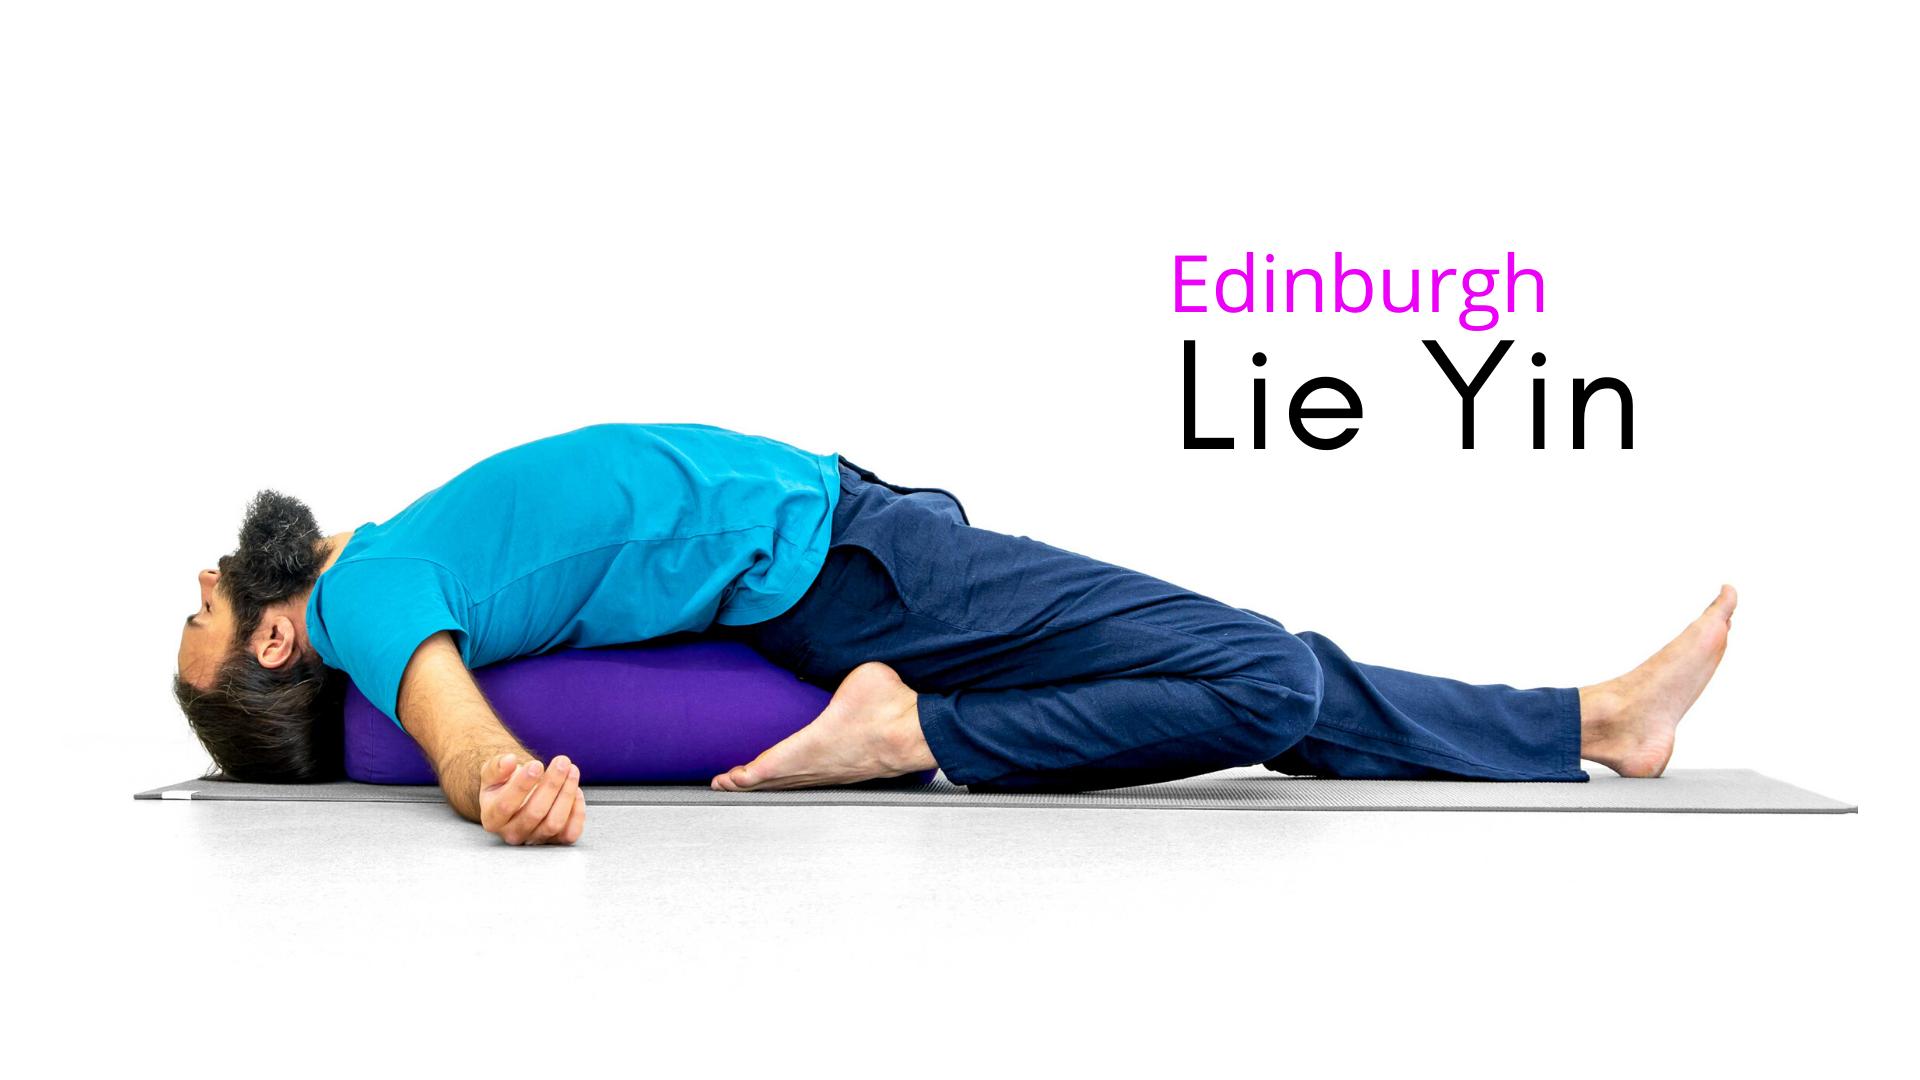 Edinburgh Lie Yin!